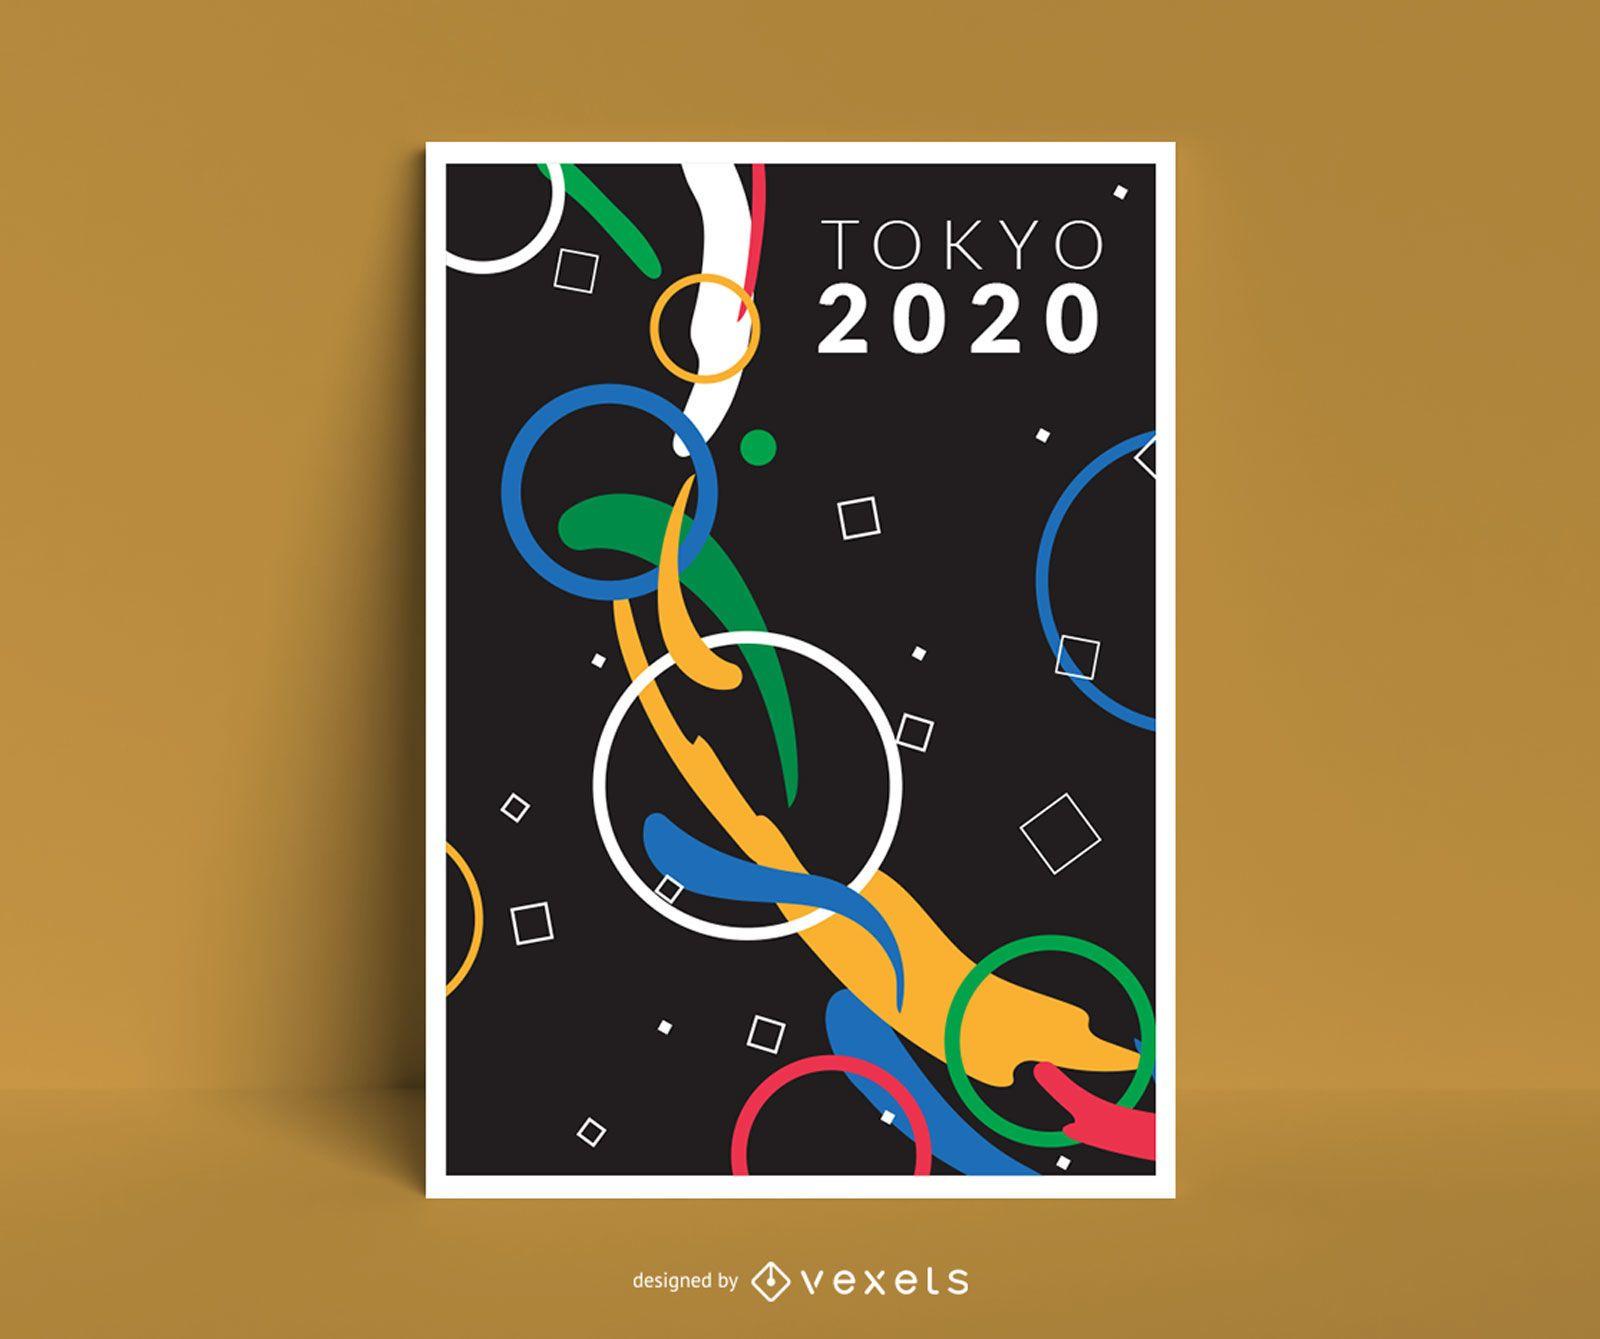 Abstract Tokyo 2020 Poster Design